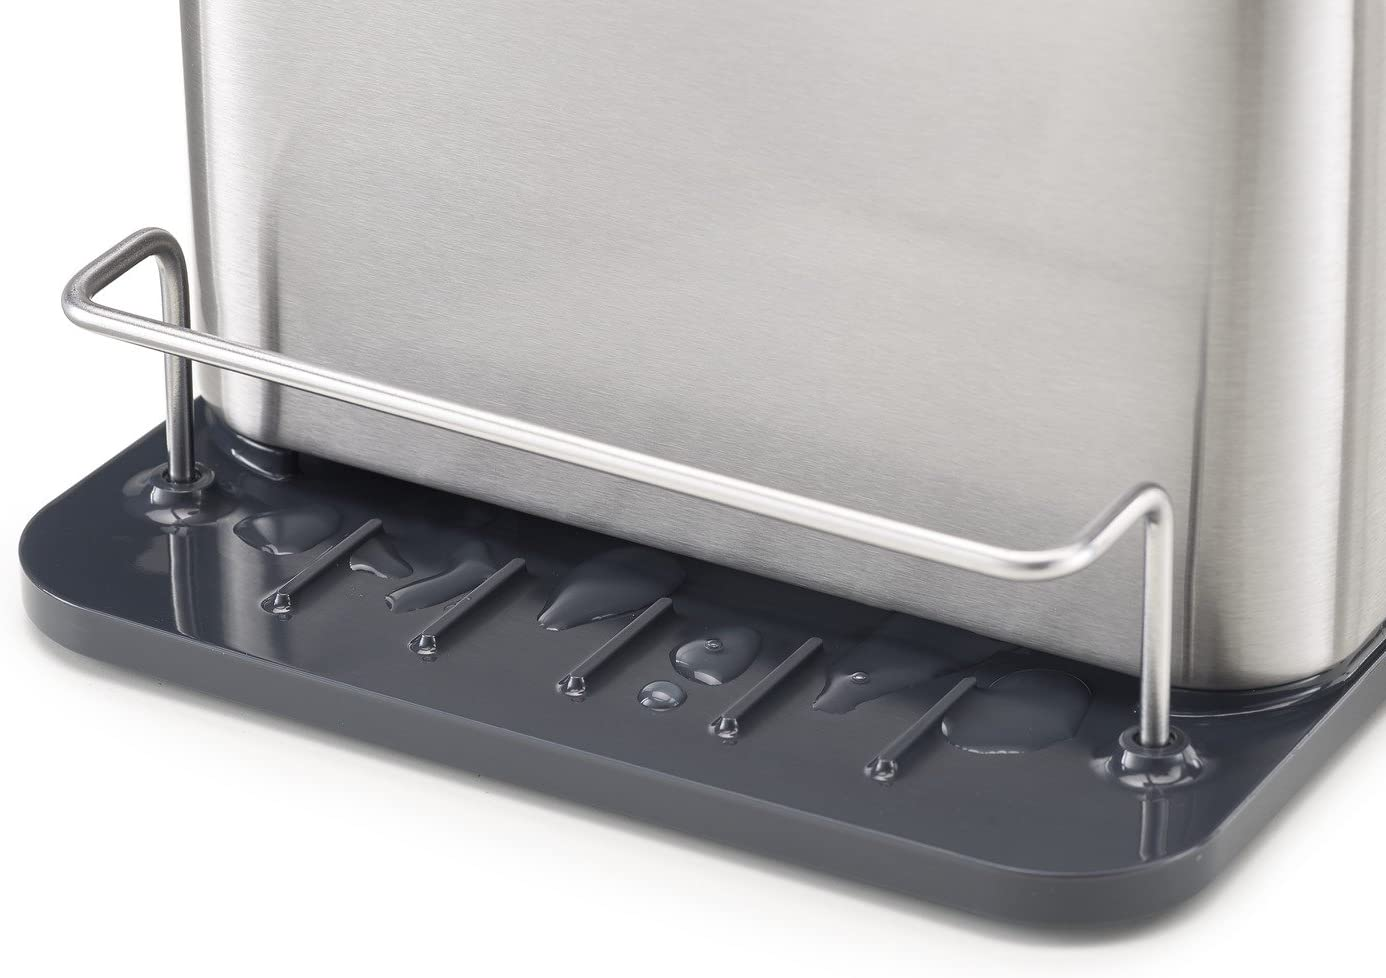 Silver /& Joseph Intelligent Waste Carbon Odour Filter Refills Pack of 2 Joseph Joseph Surface Stainless-Steel Caddy Sink Area Organiser